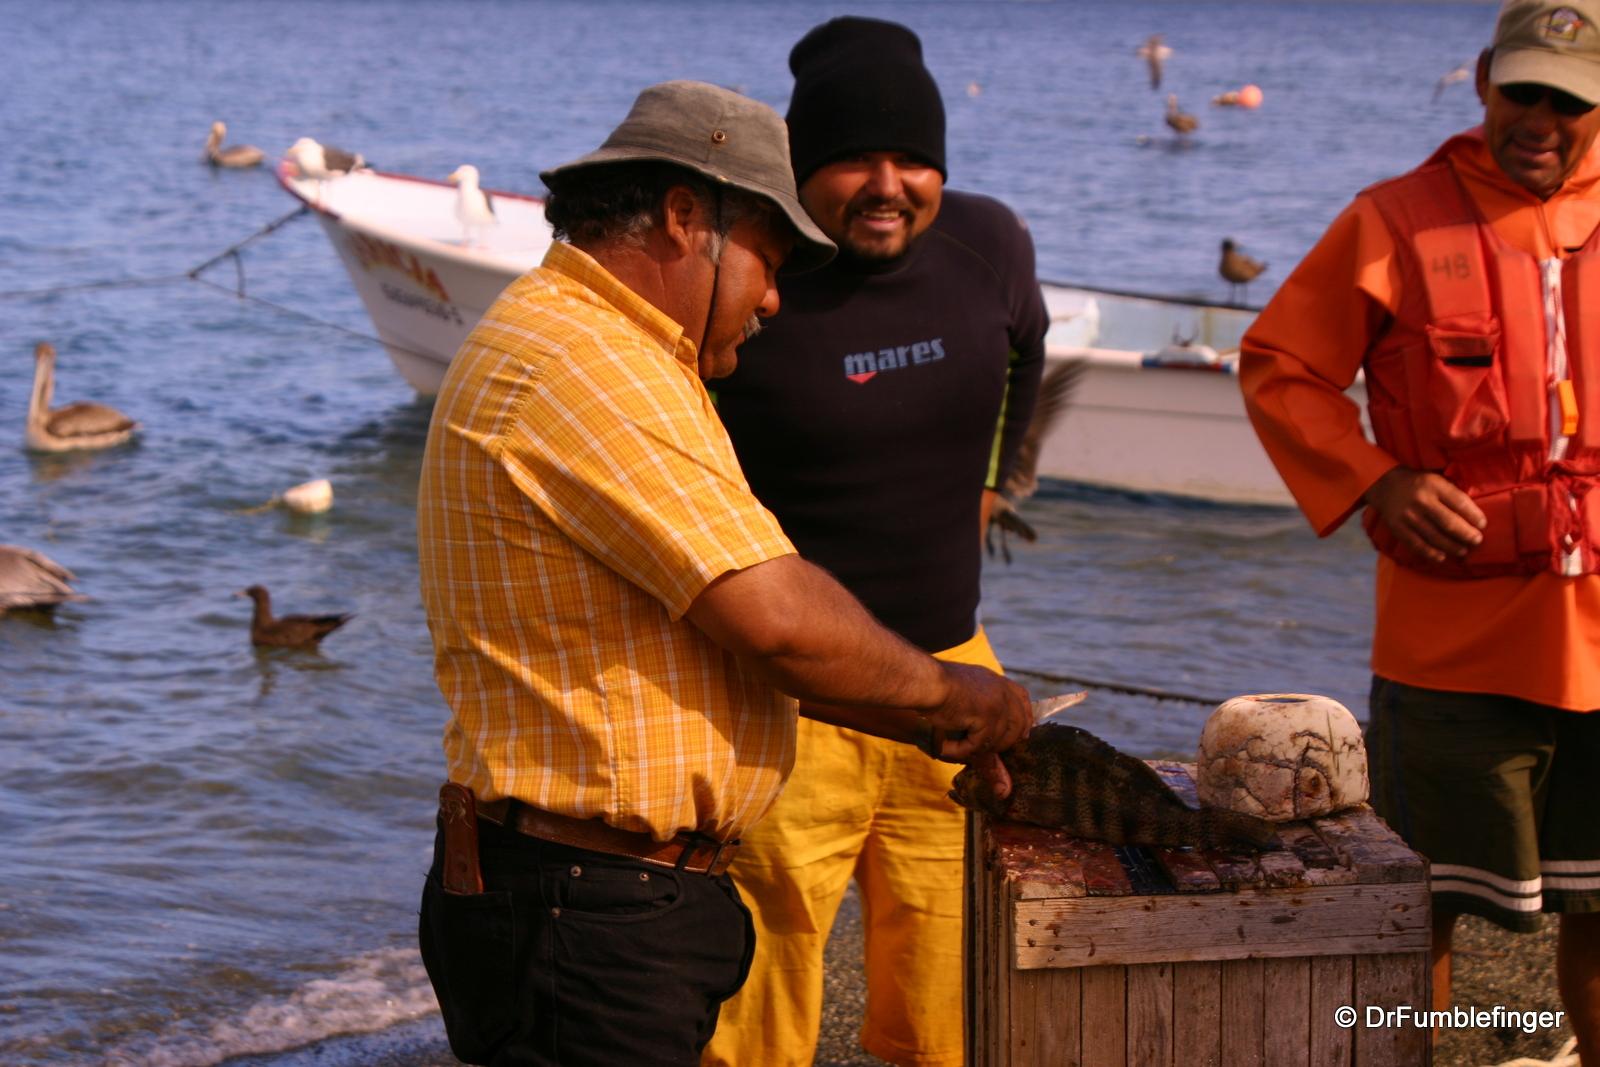 Fisherman cleaning fish, Puerto Magdalena